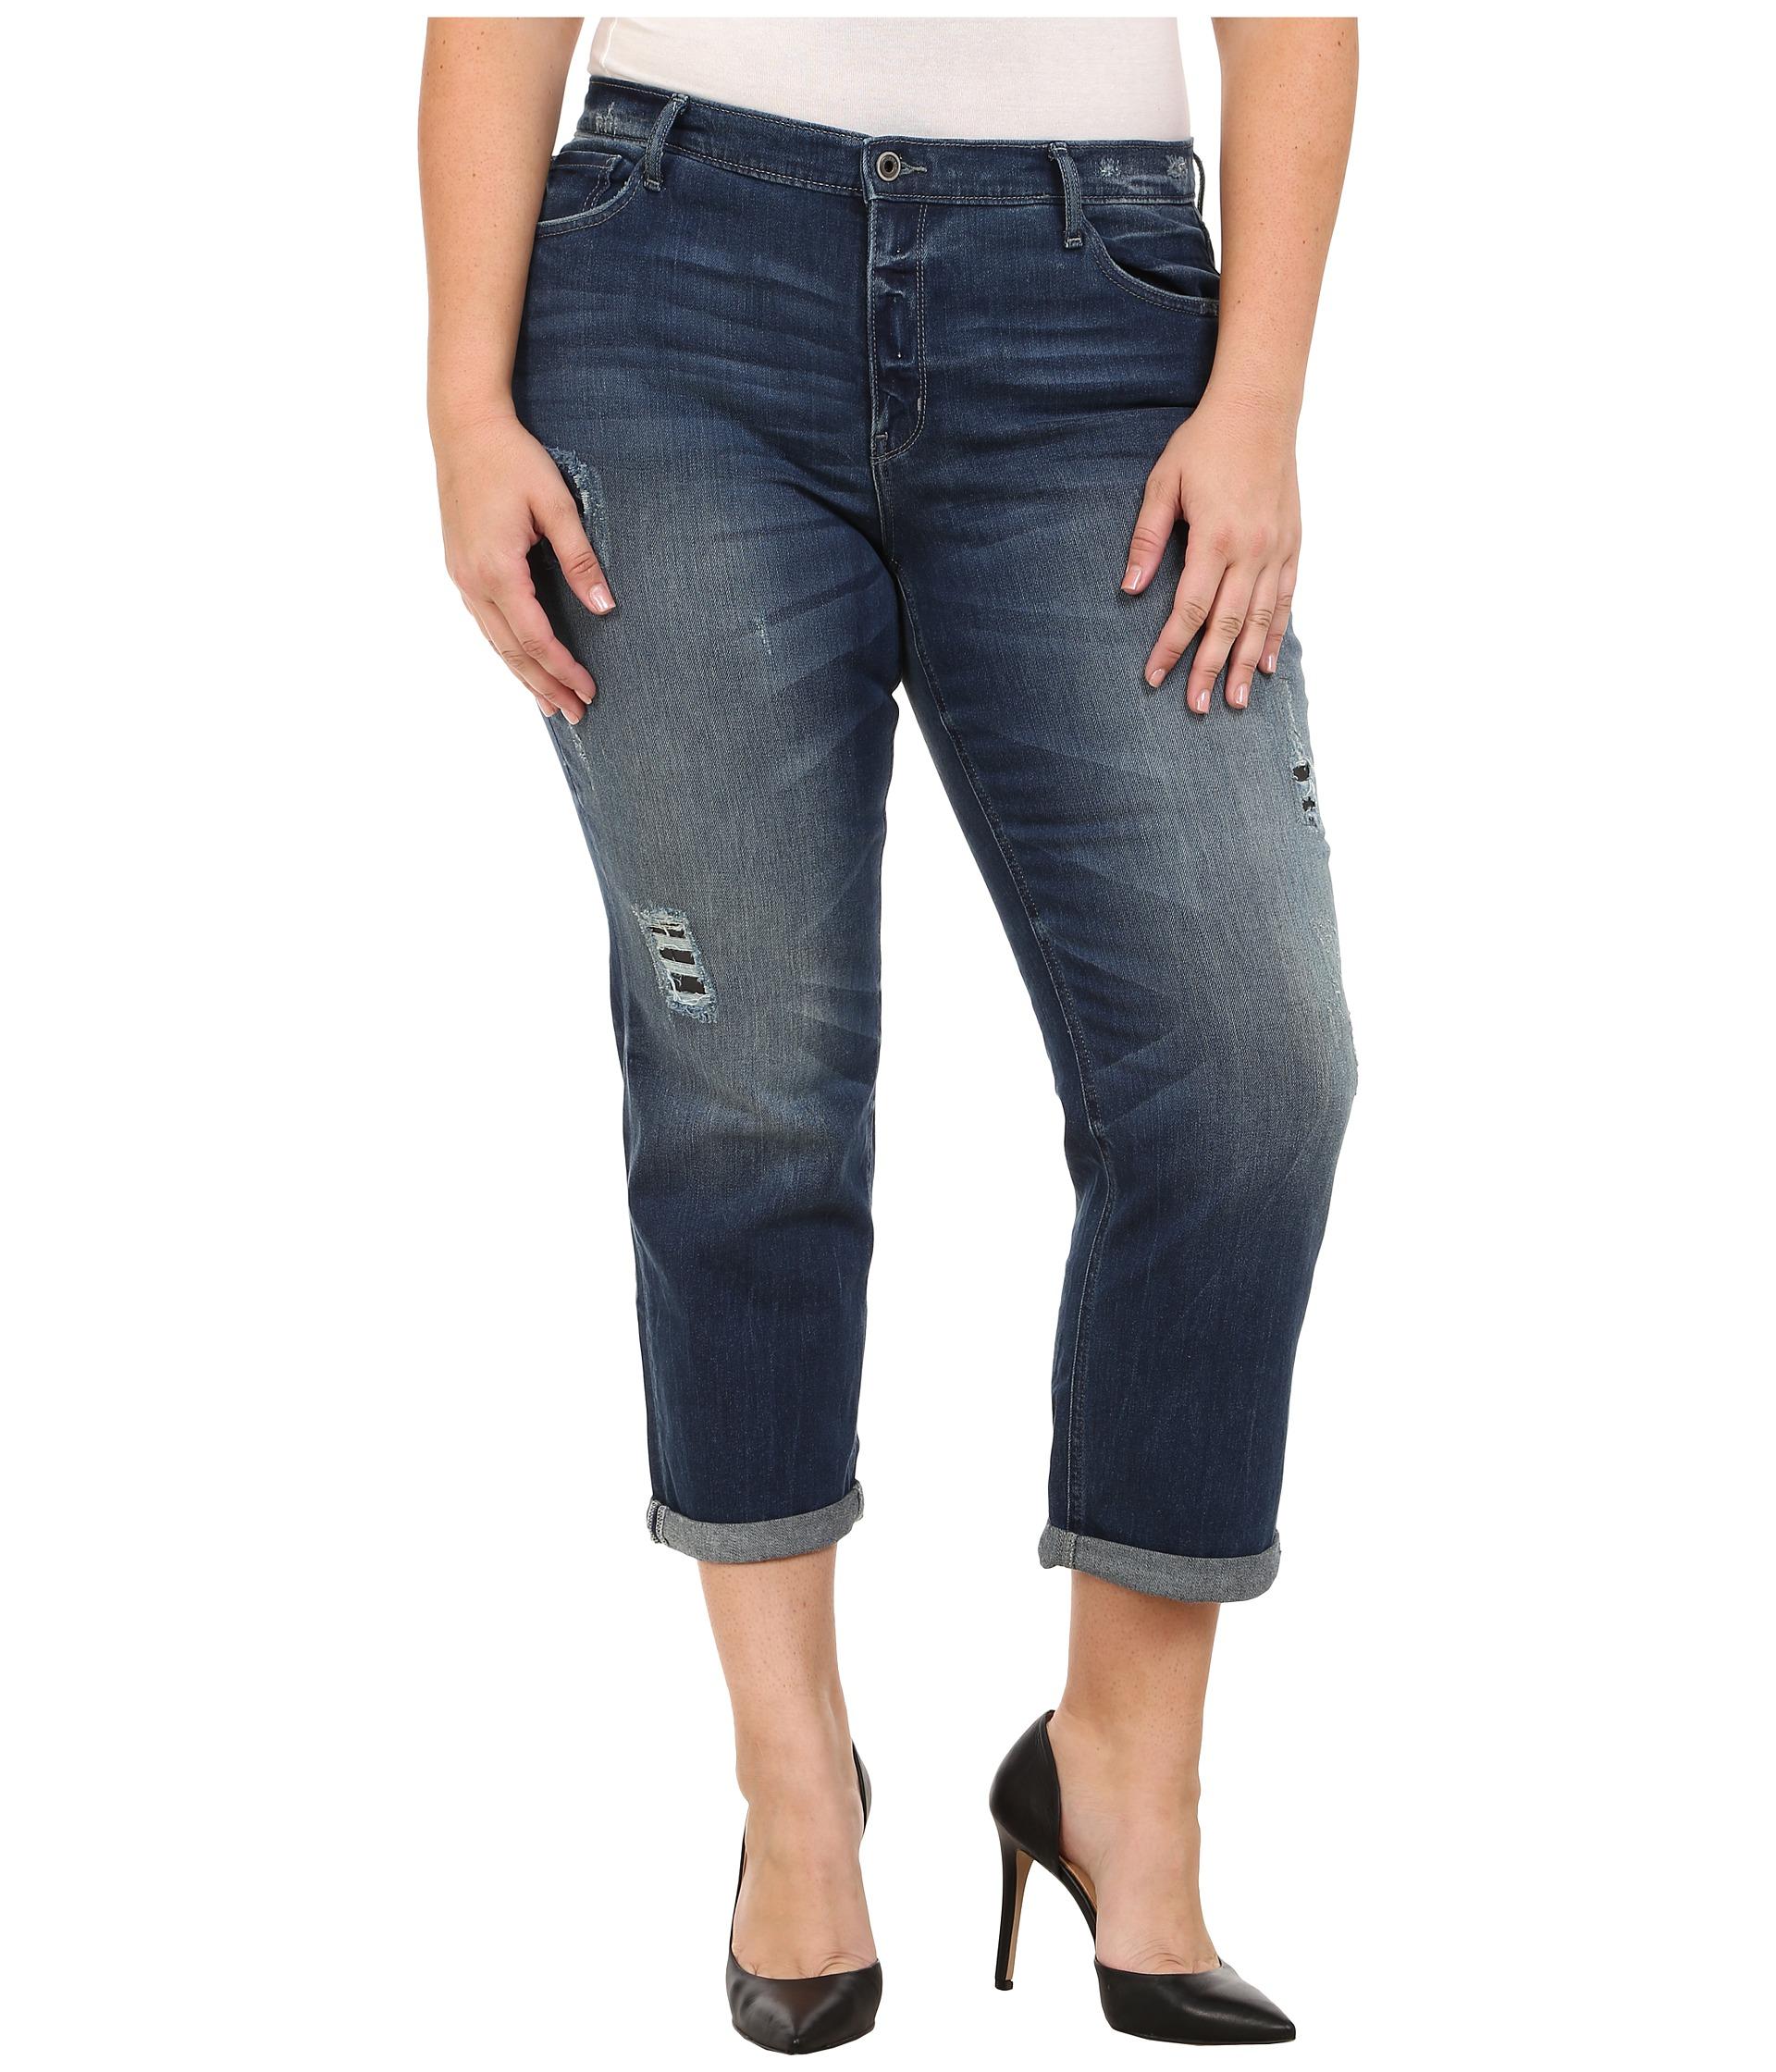 Ярнарт джинс доставка